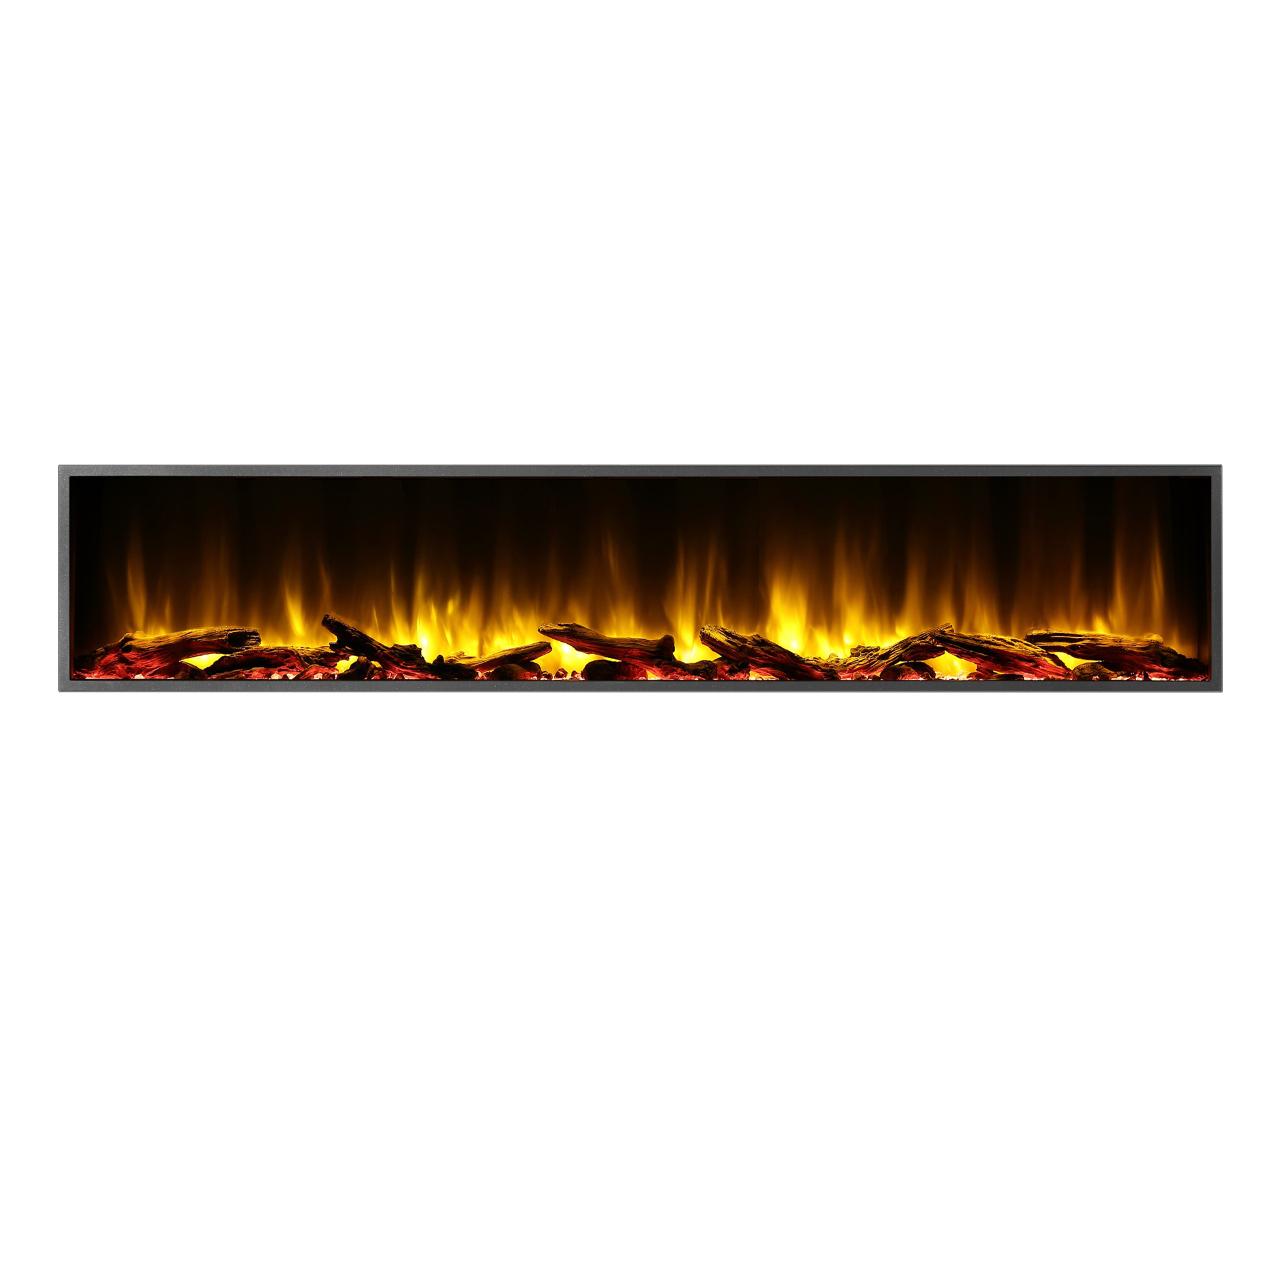 "Dynasty Harmony BEF Series 80"" Linear Electric Fireplace"